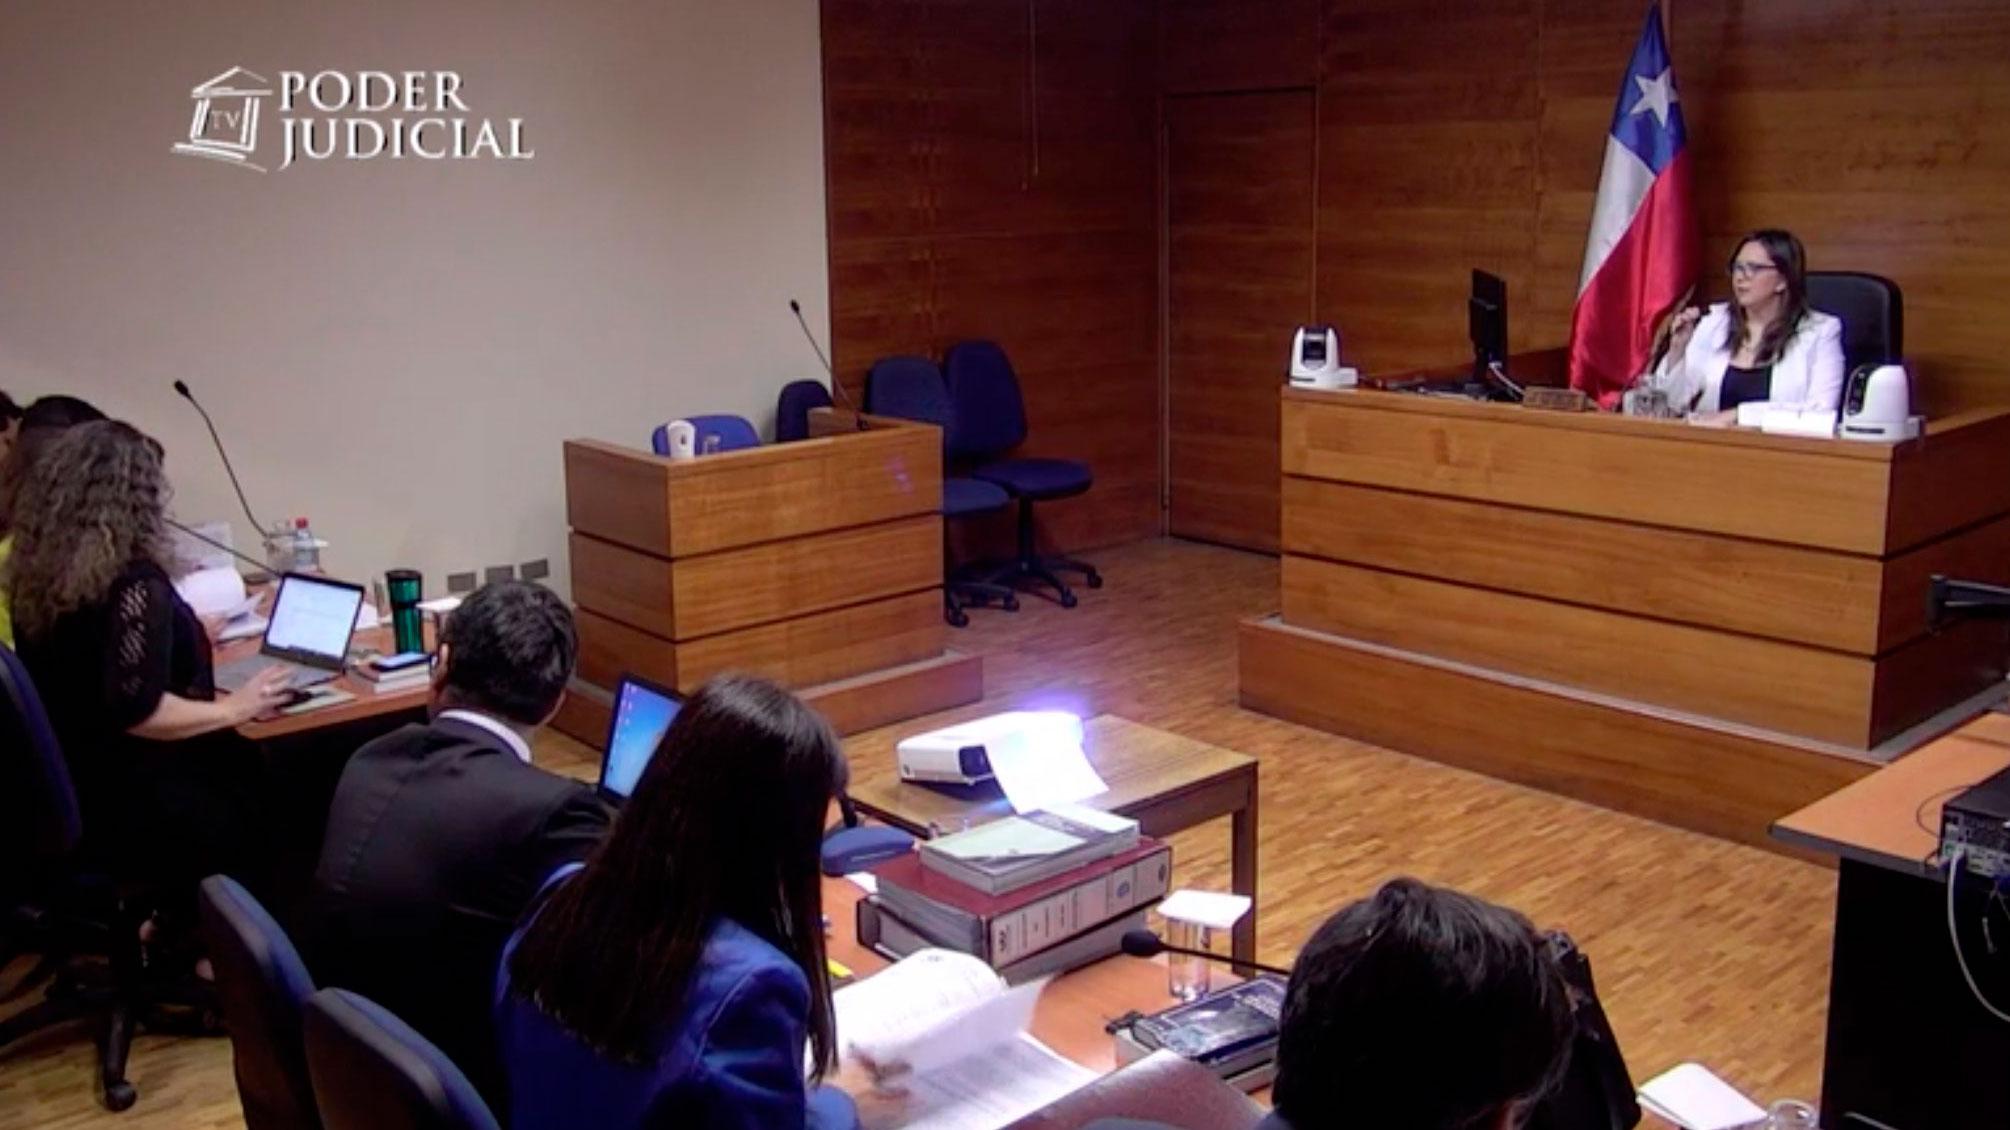 Decretan firma mensual y arraigo nacional para removido ministro de Rancagua Marcelo Vásquez